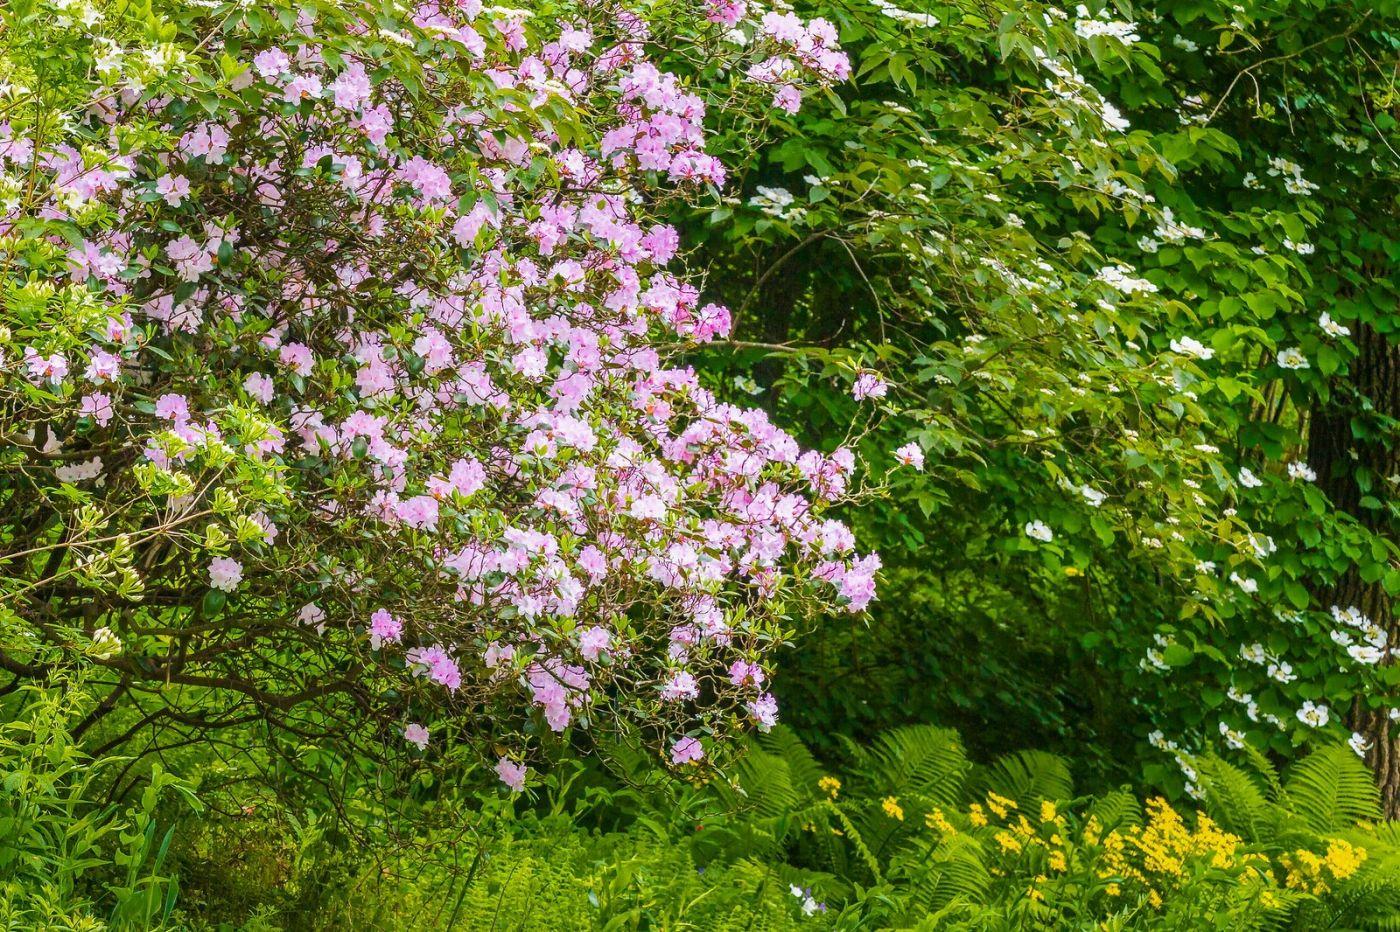 Chanticleer花园,有梦想的季节_图1-32